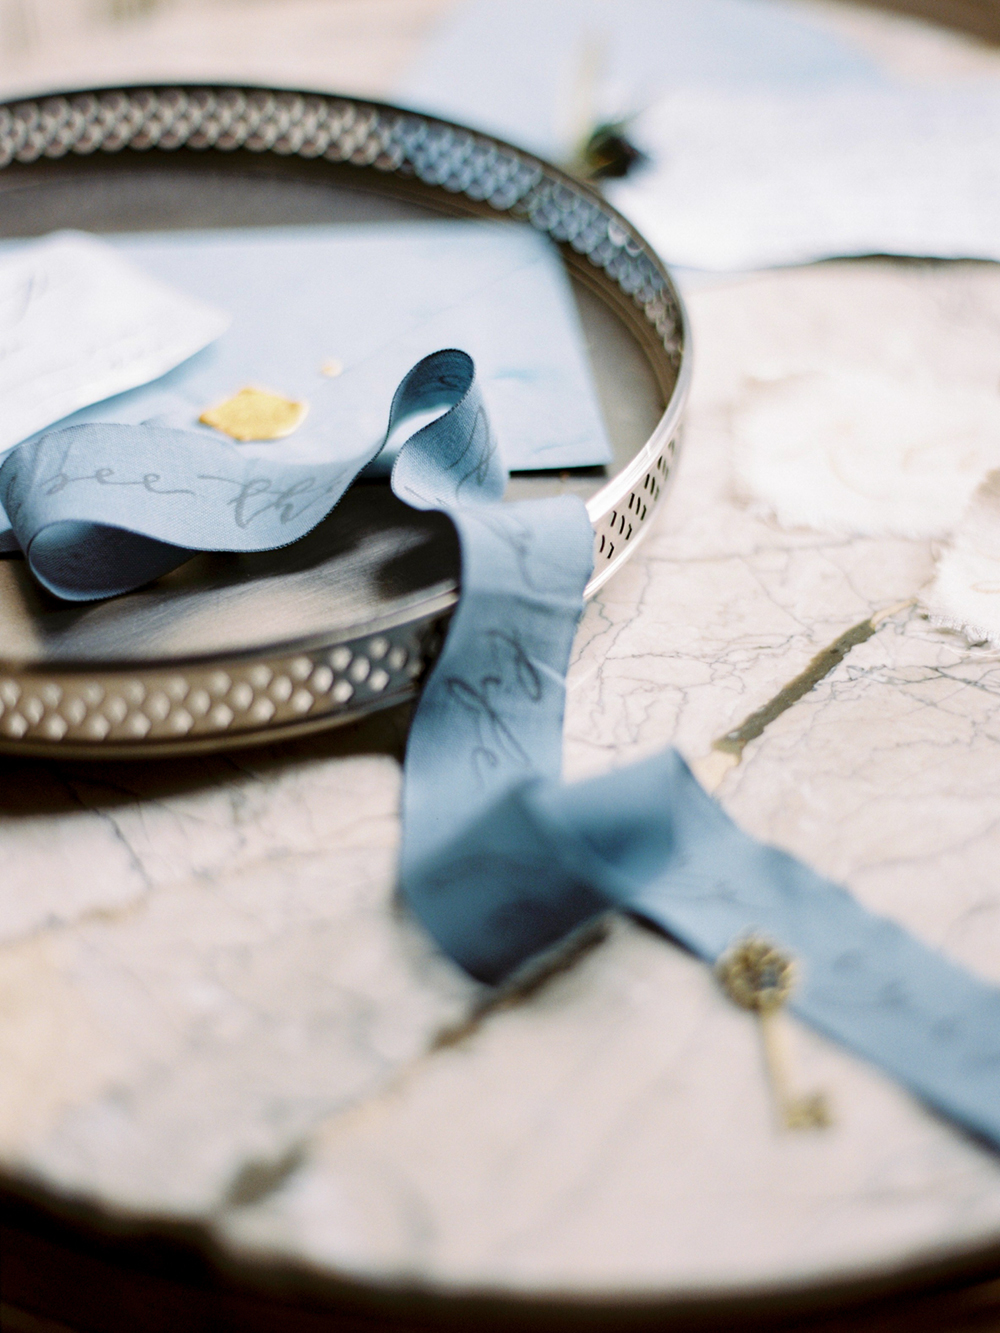 algarve_wedding_photography_winter_blues_3.jpg